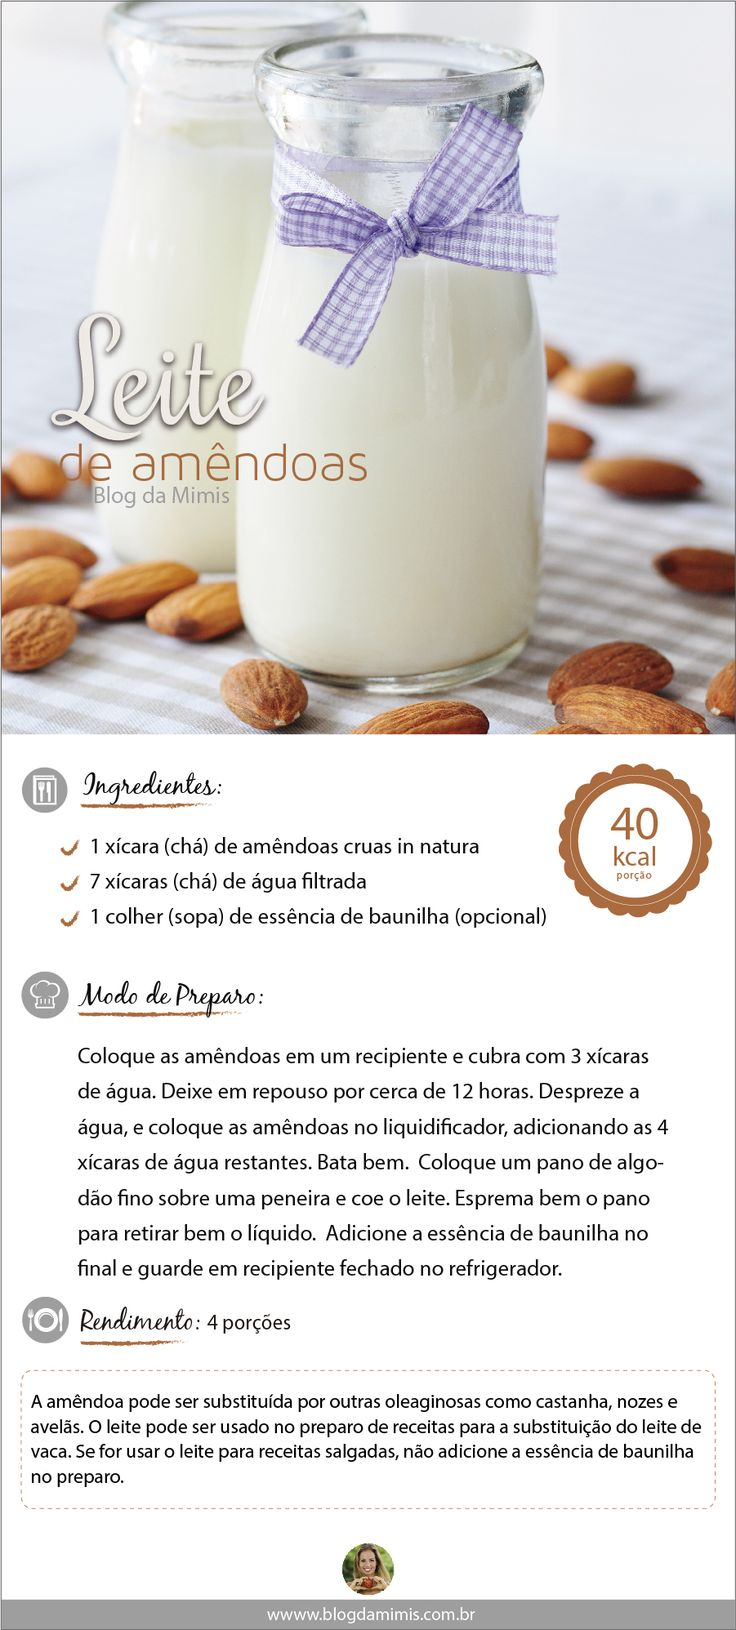 leite-de-amêndoas-blog-da-mimis-michelle-franzoni-01